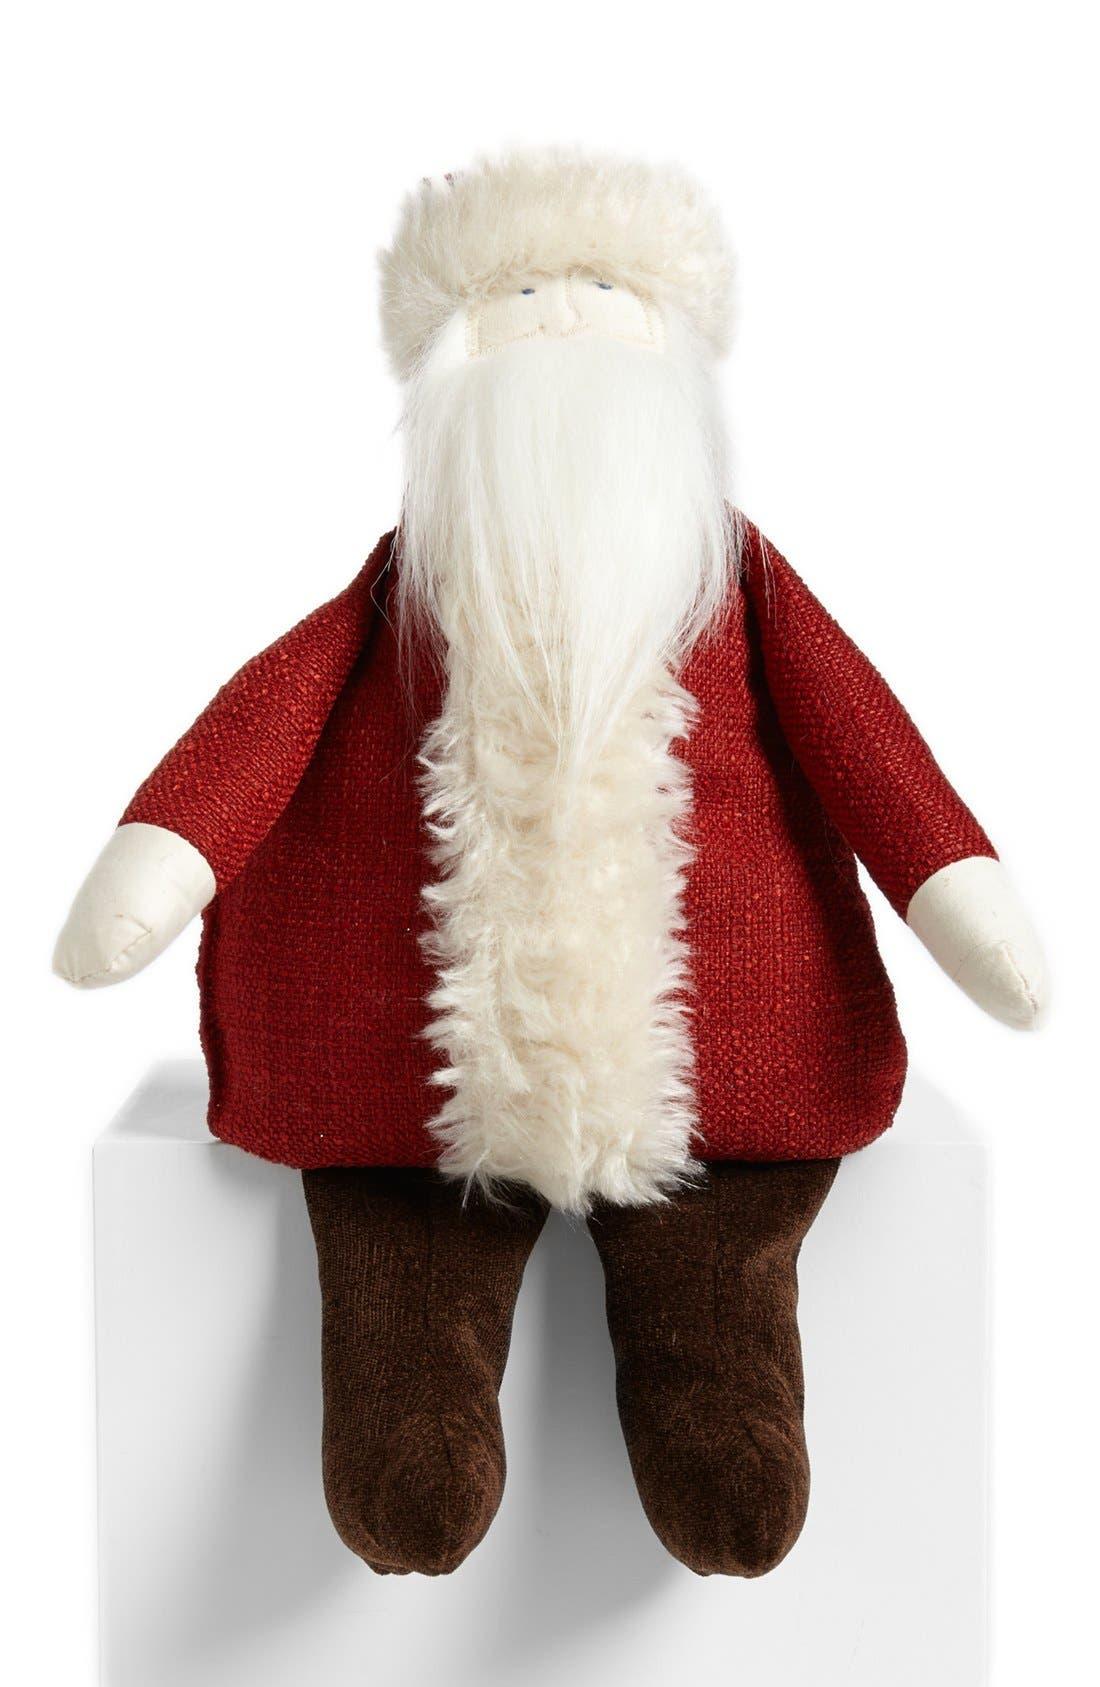 Alternate Image 1 Selected - Woof & Poof 'Santa - Small' Doll